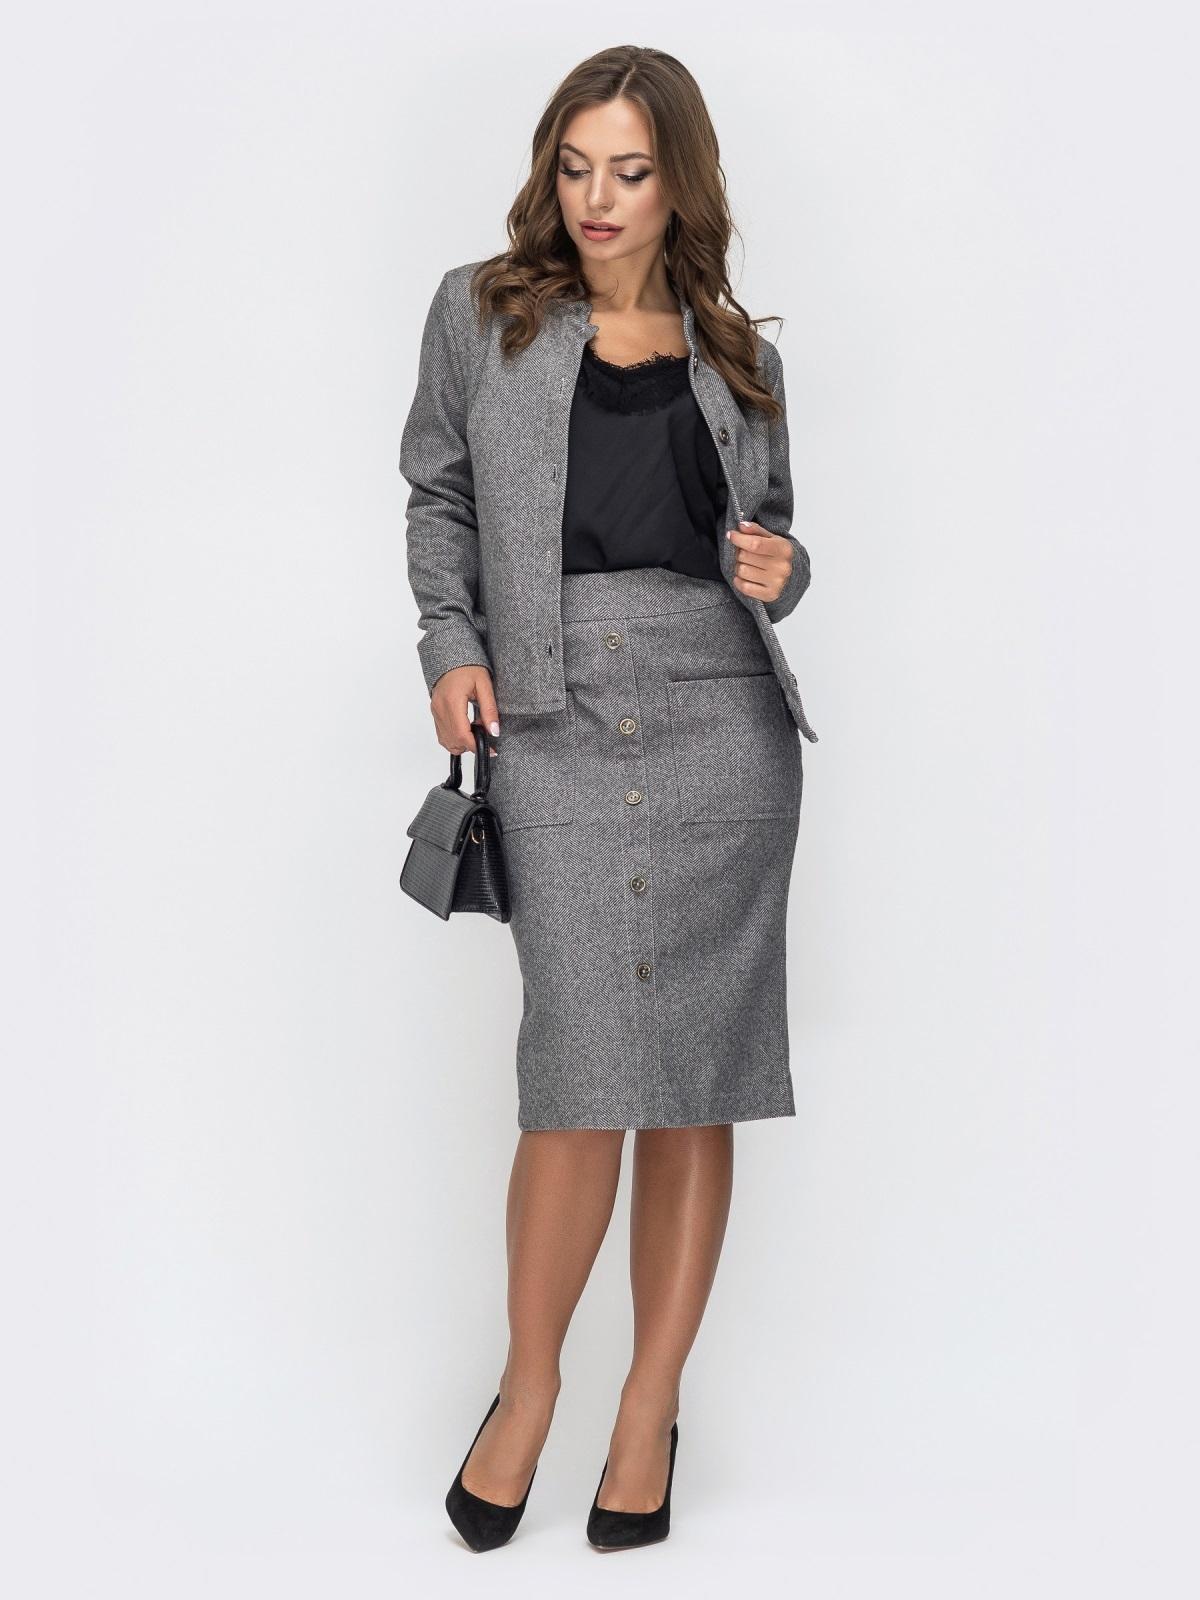 Серый комплект из жакета и юбки-карандаш 44989, фото 1